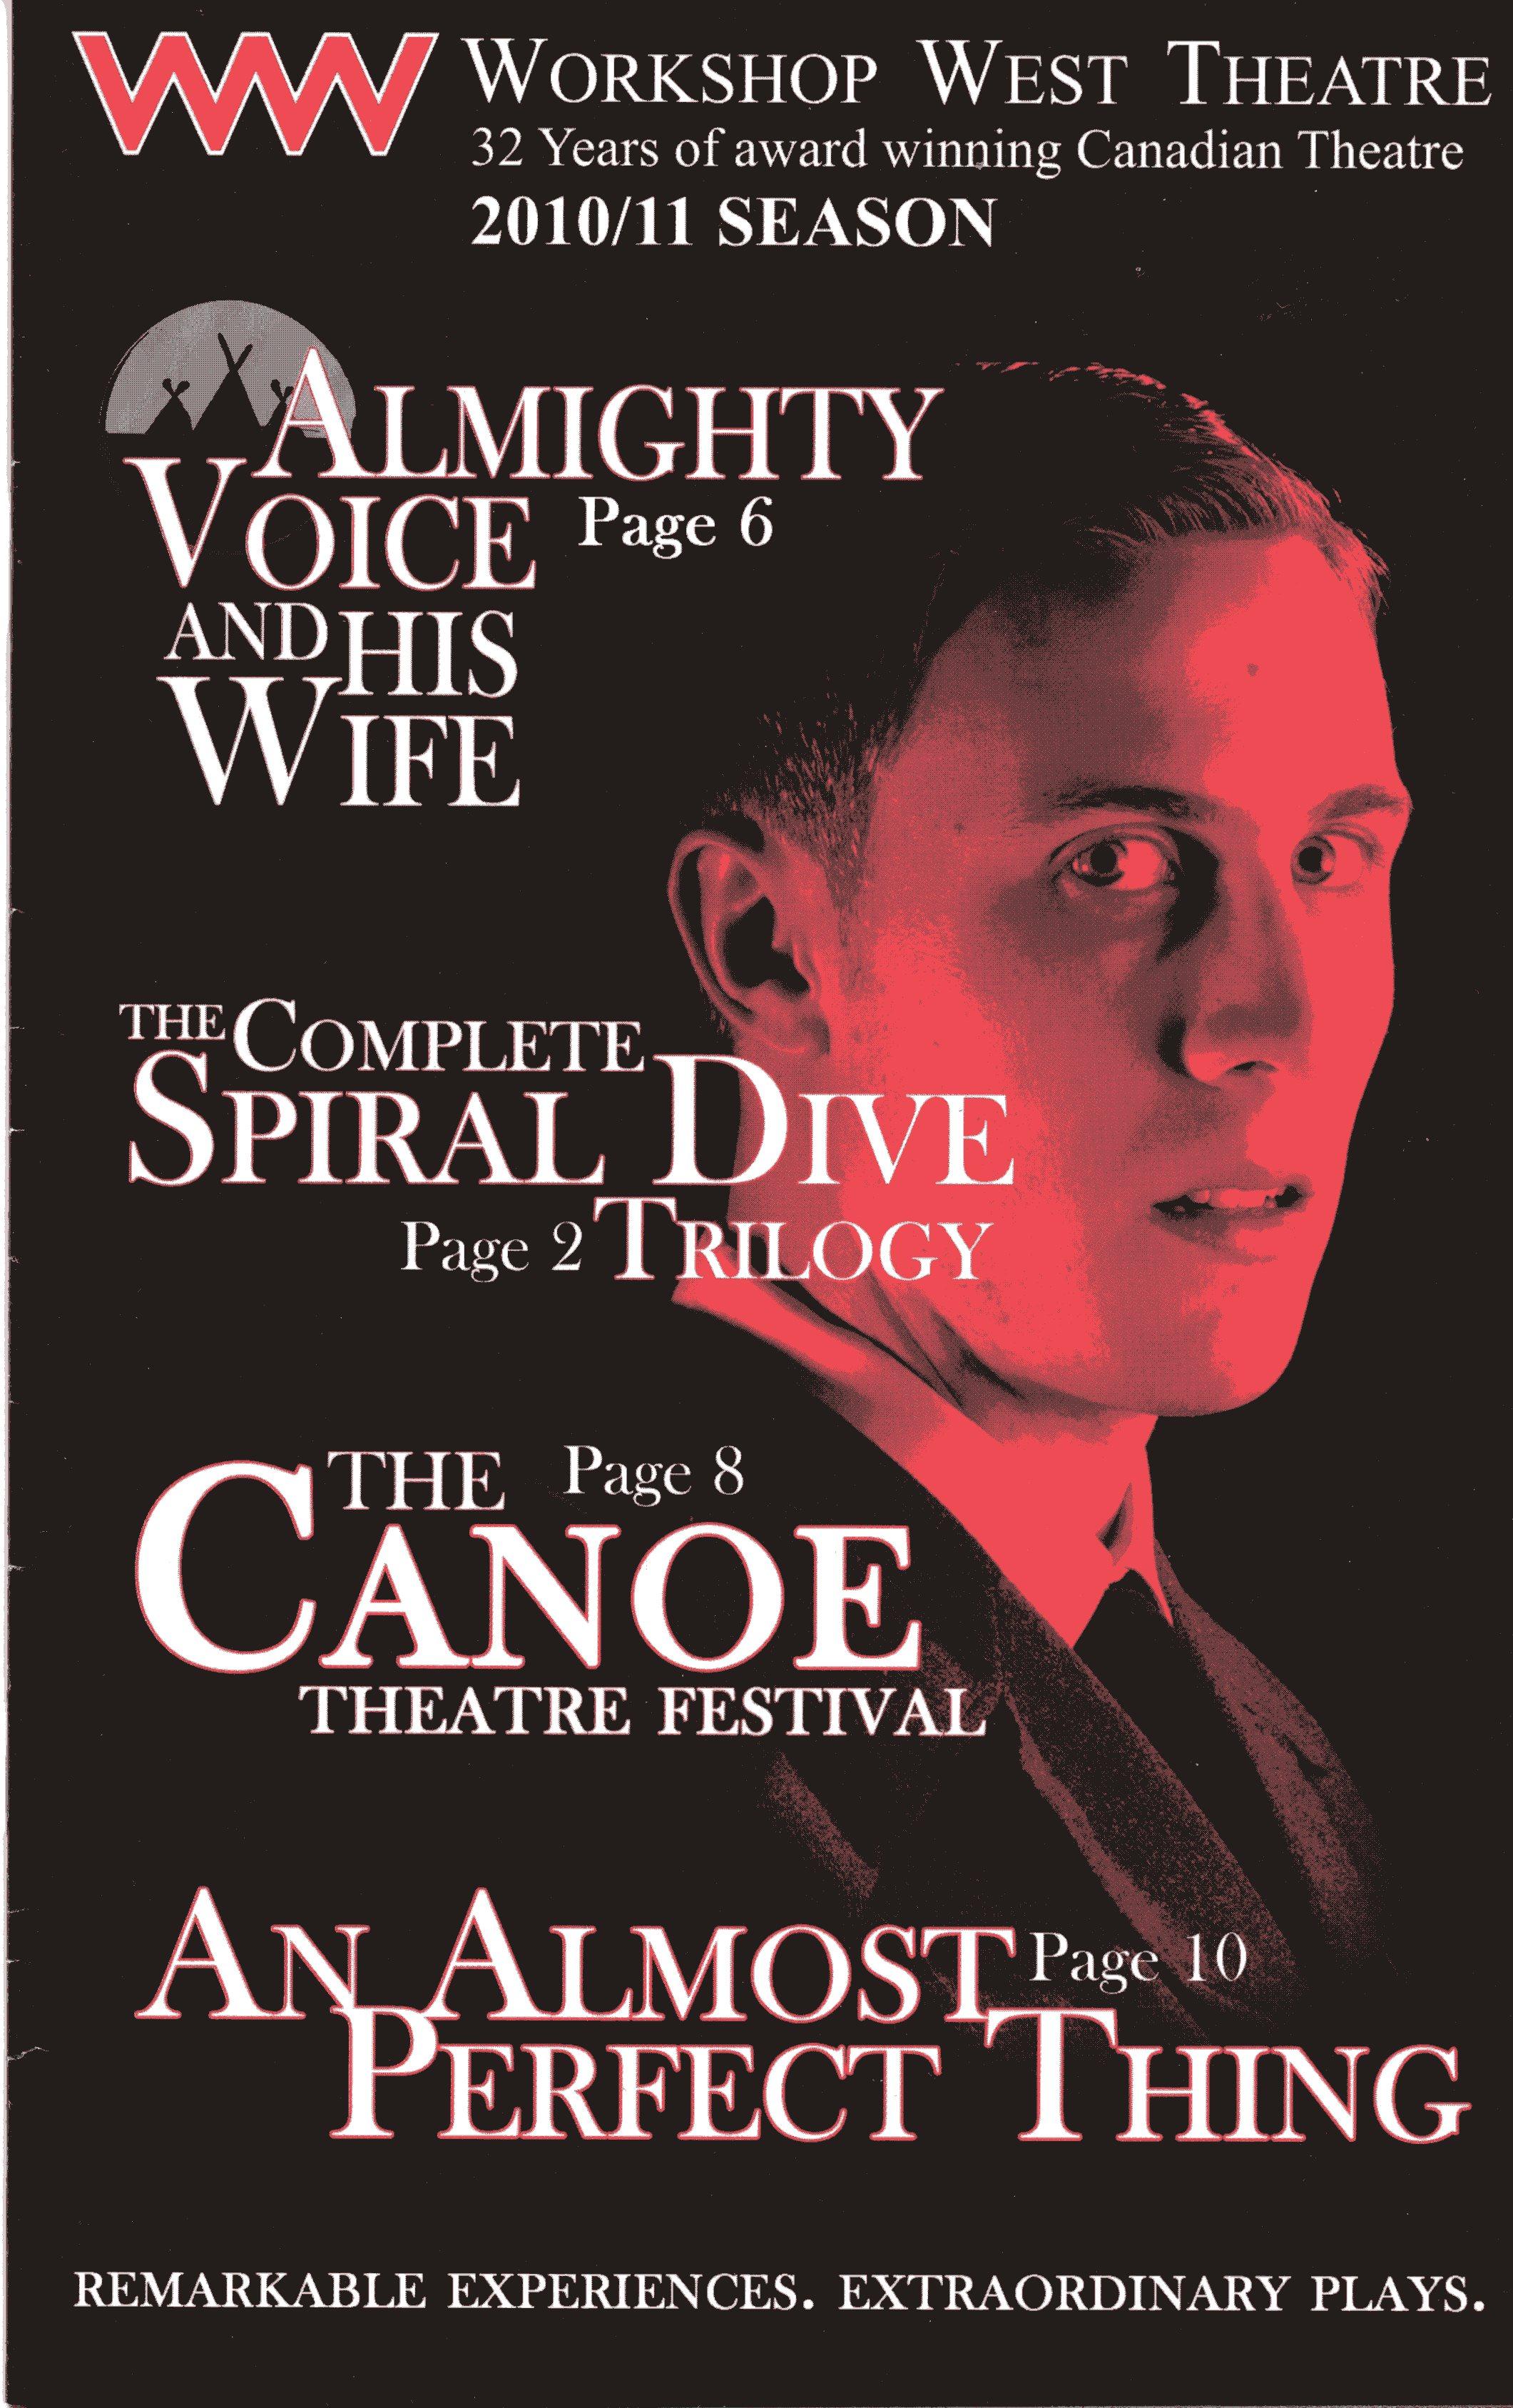 Season Program Book Cover (2010-2011).jpg